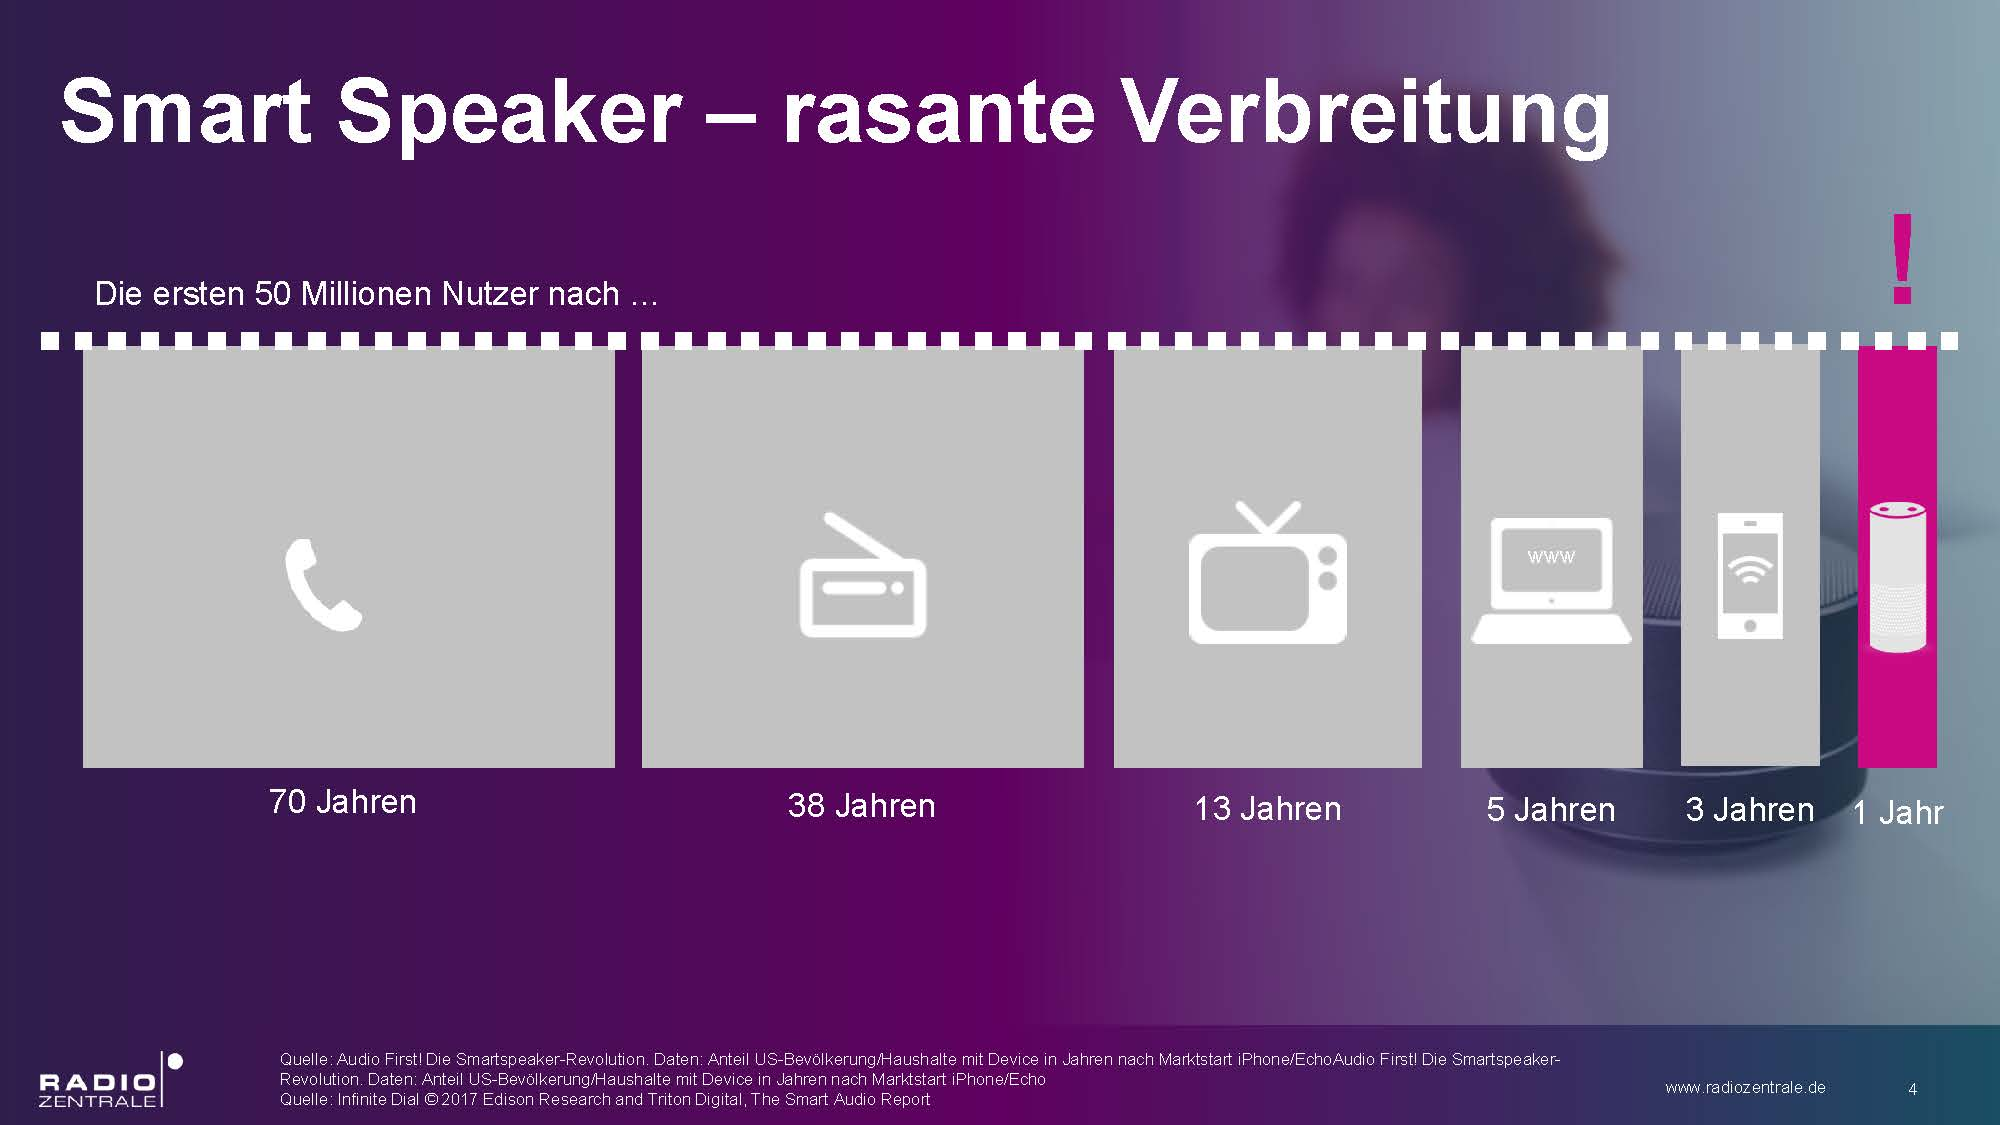 smart-speaker-rasante-verbreitung